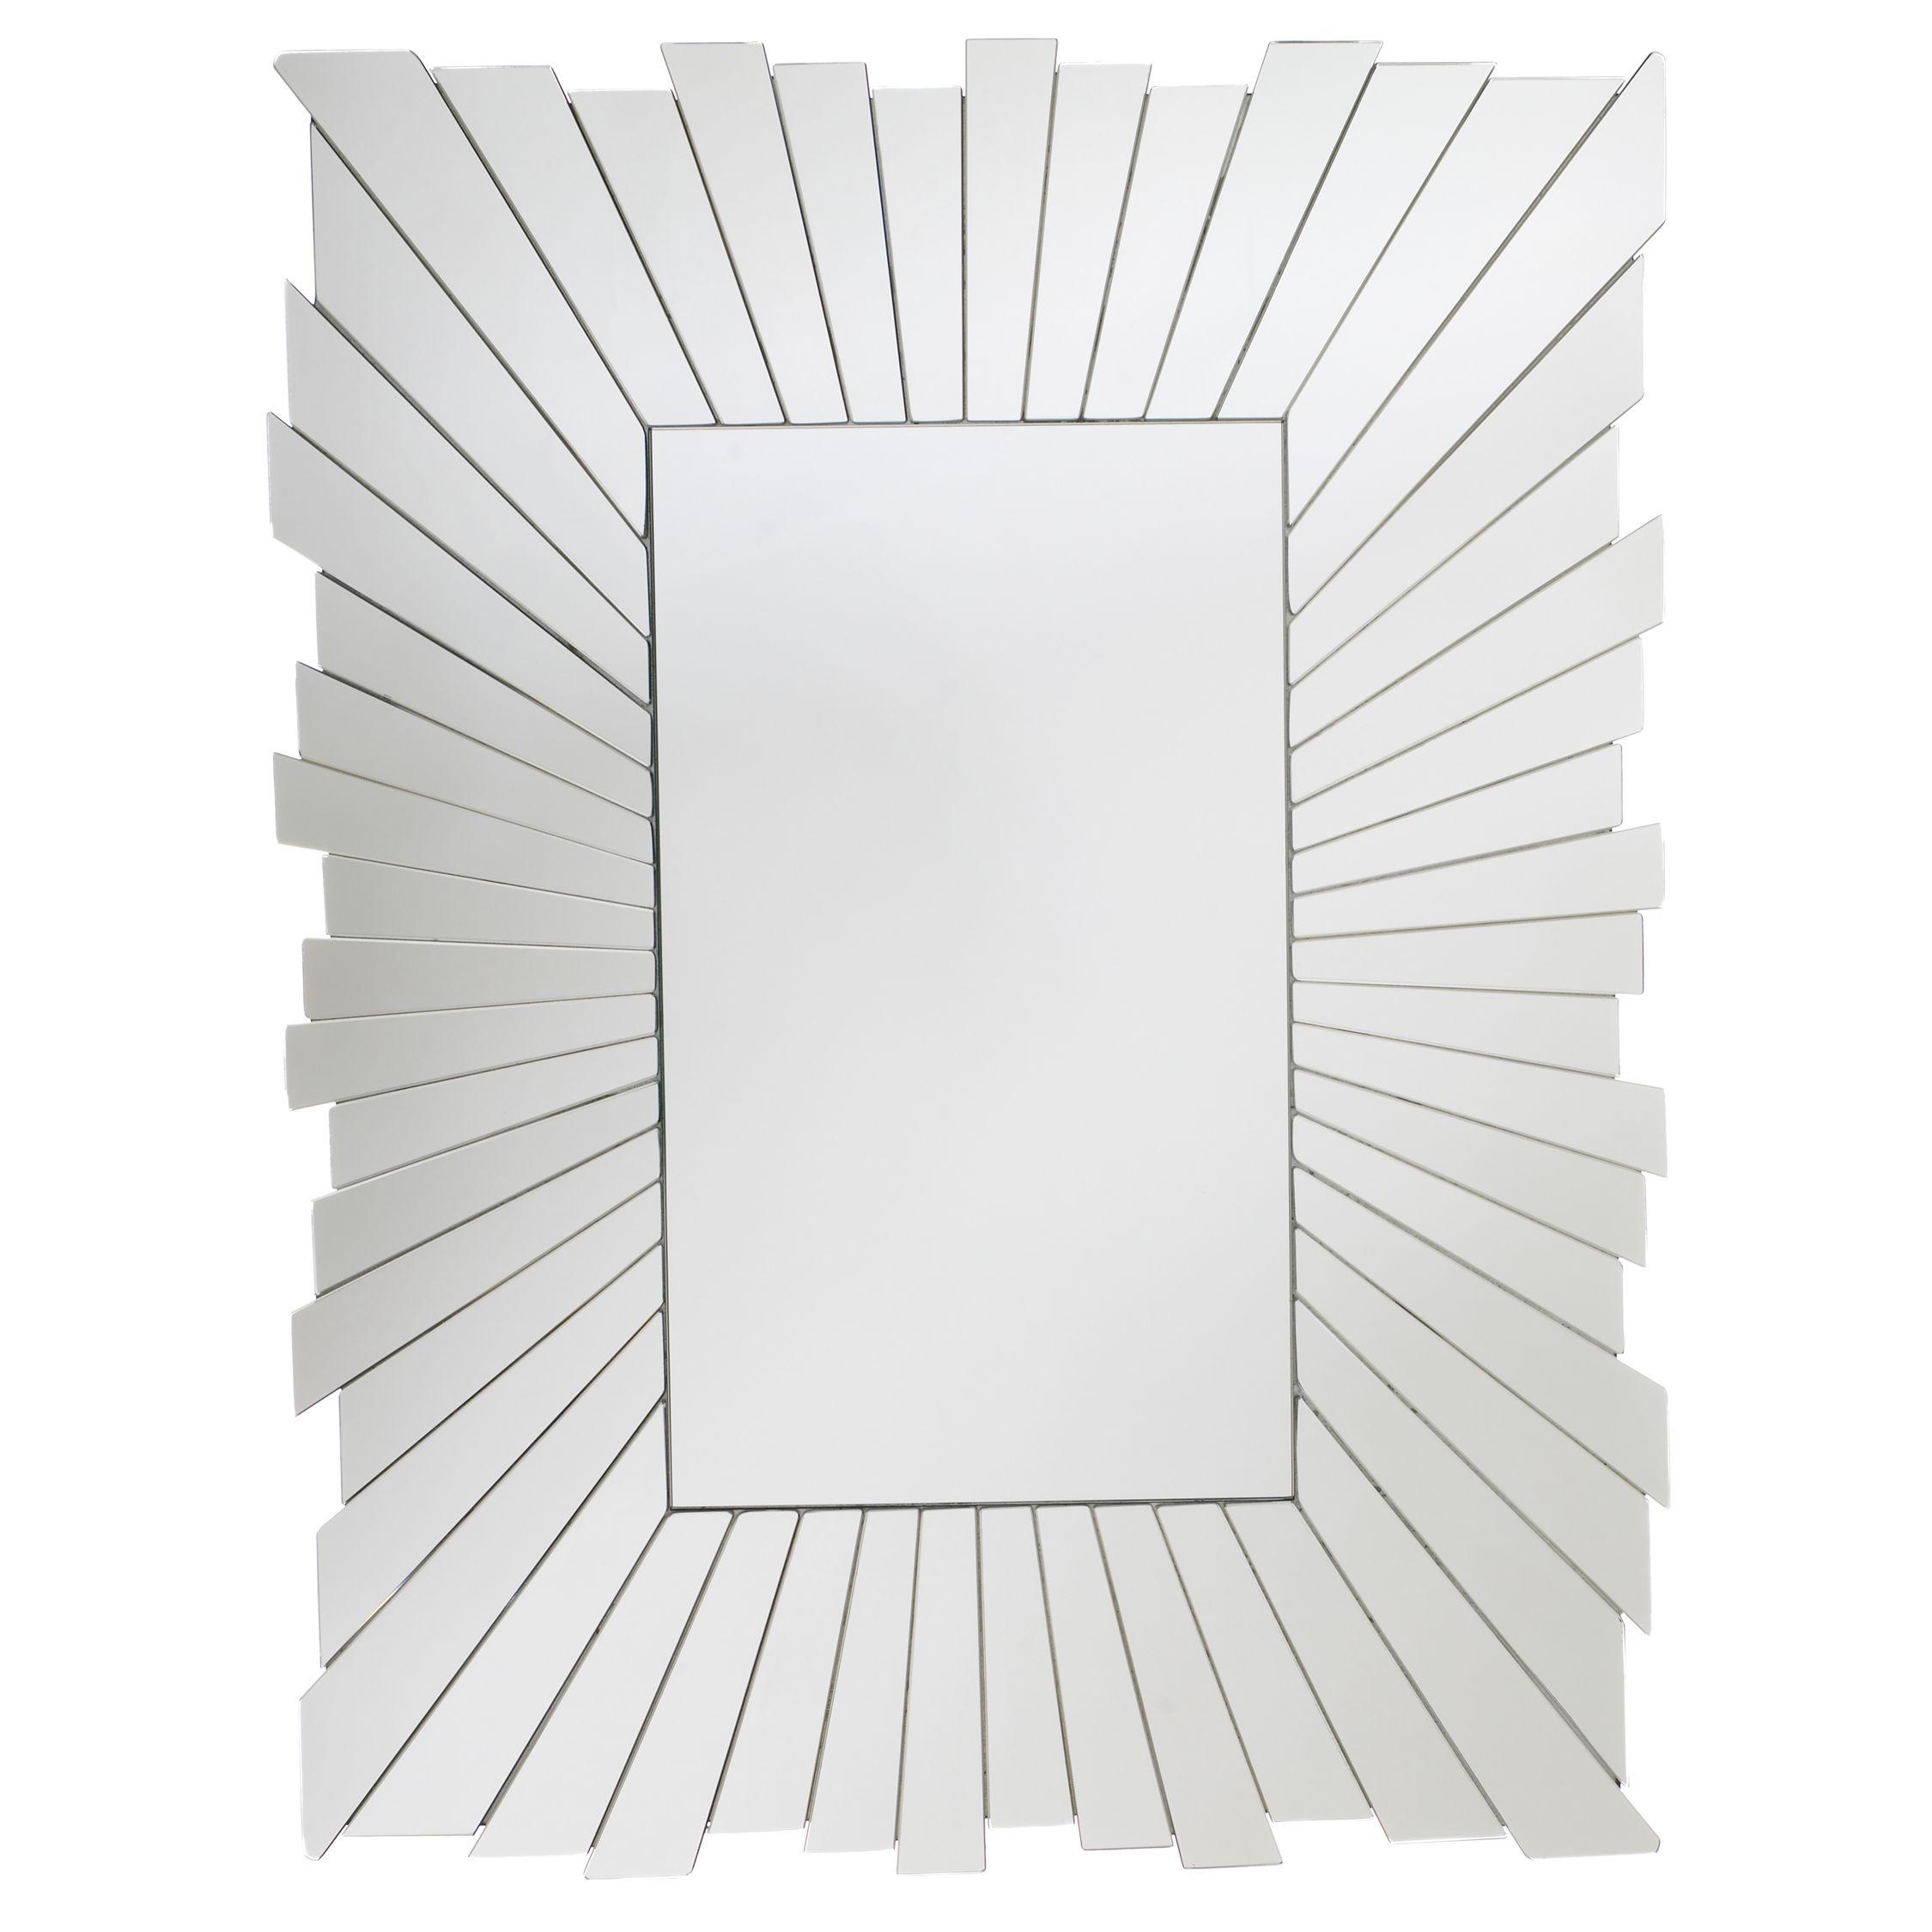 Sunray Rectangular Mirror, H80xW61cm at John Lewis